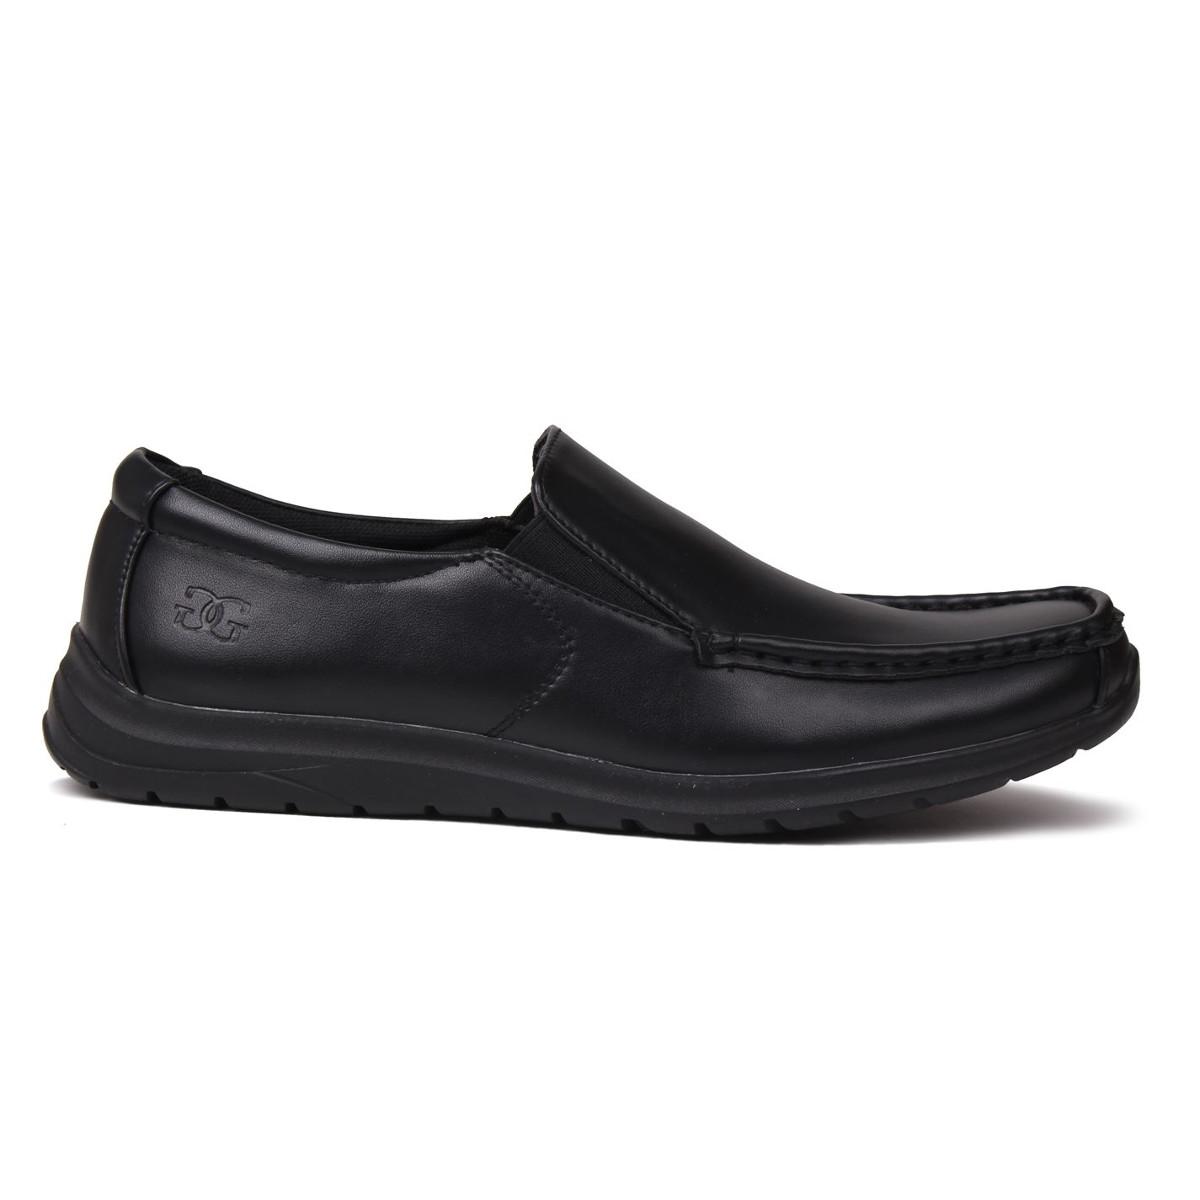 Giorgio Boys' Bexley Slip-On Casual Shoes - Black, 11